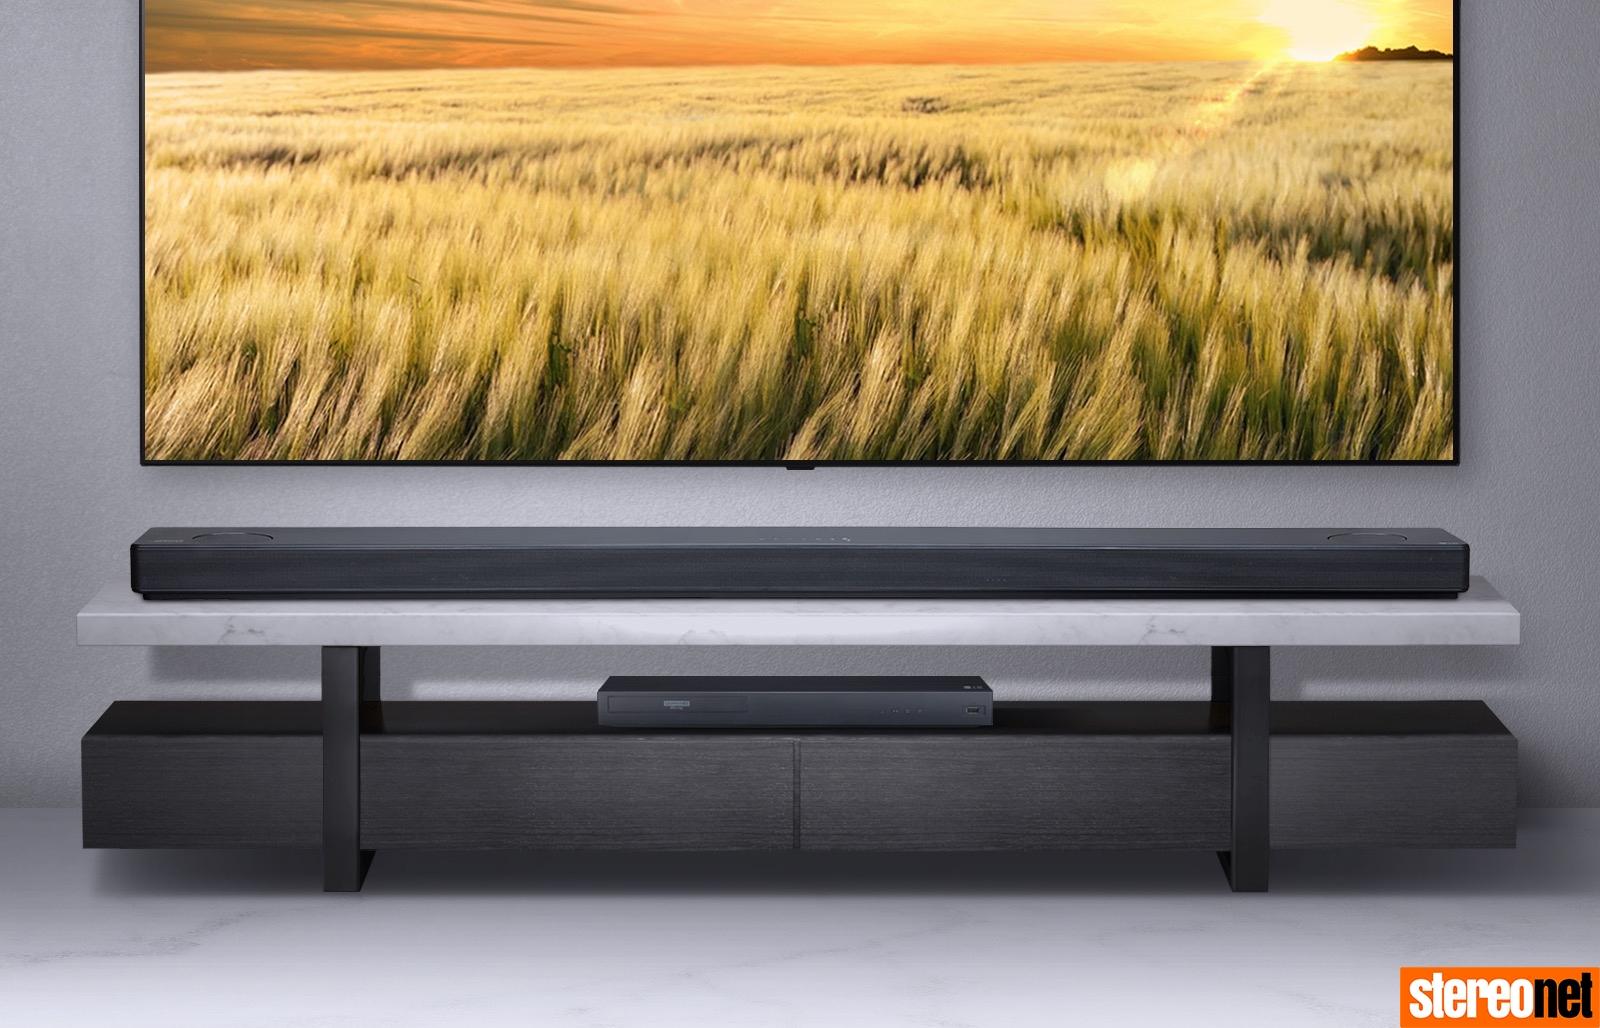 Lg C9 Oled 4k Tv Amp Sl10yg Soundbar Review Stereonet